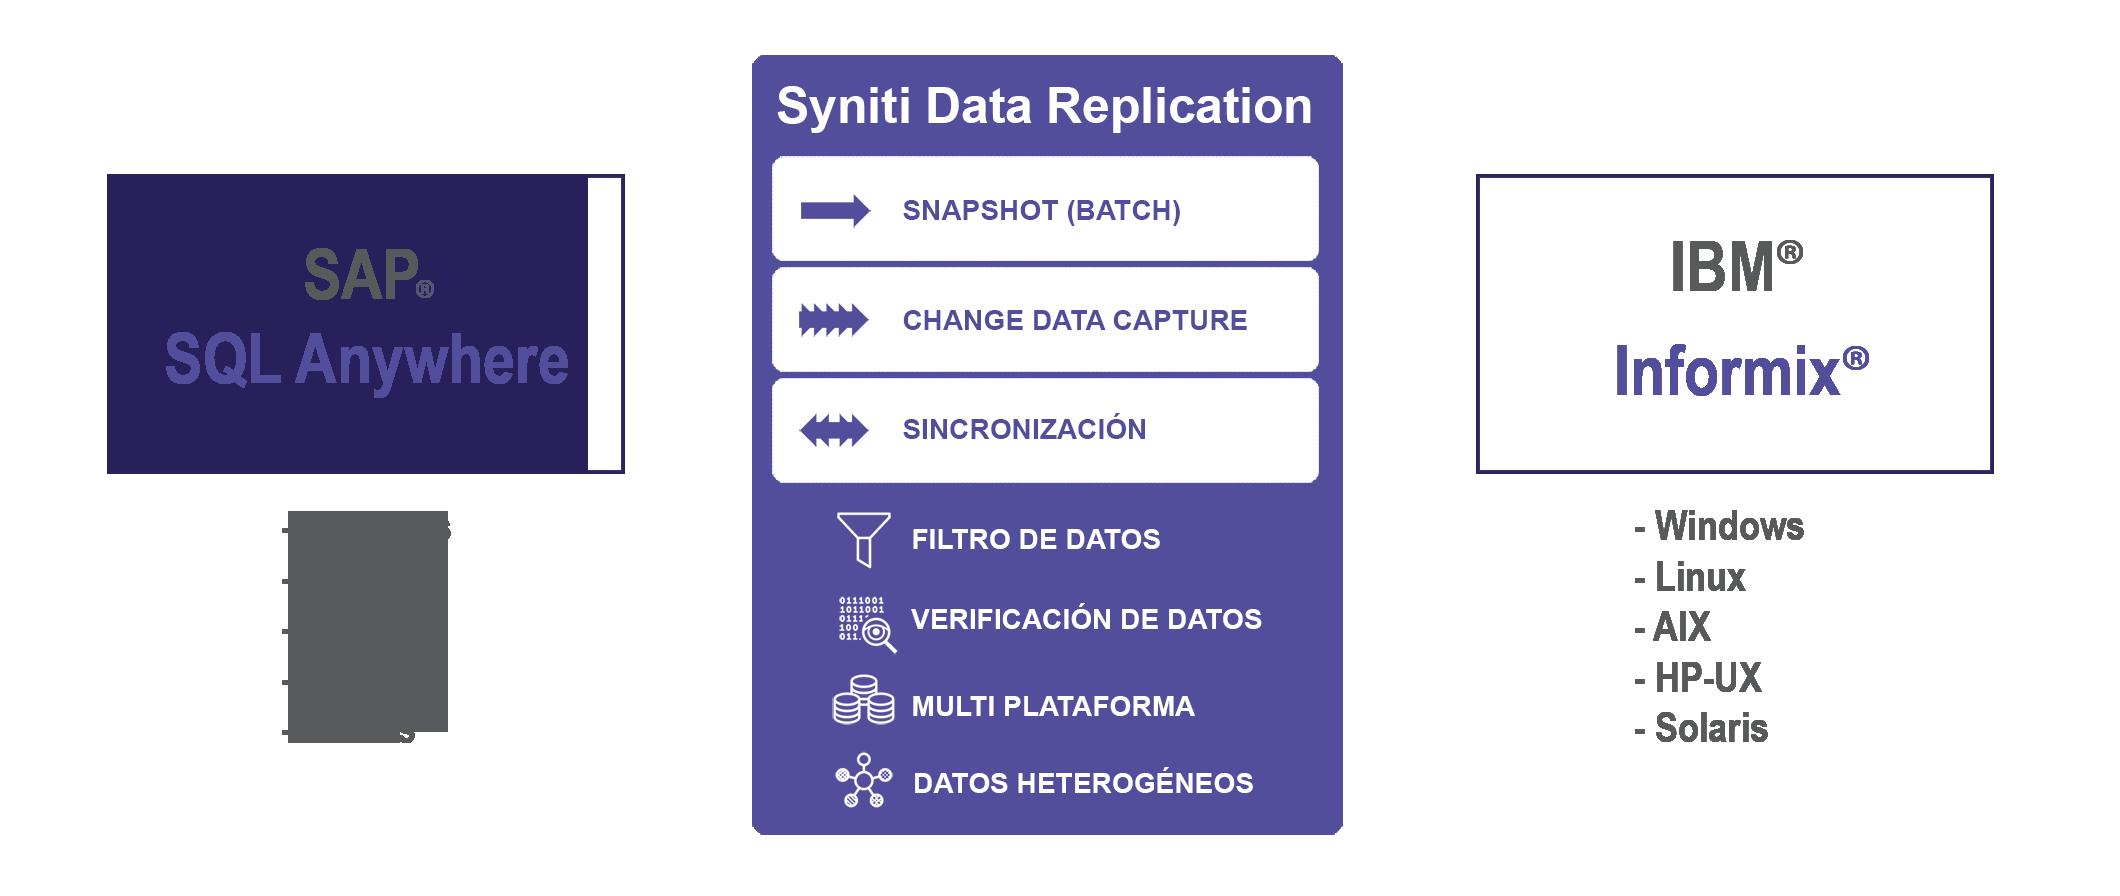 Replicacion de datos SQL Anywhere a Informix en tiempo real